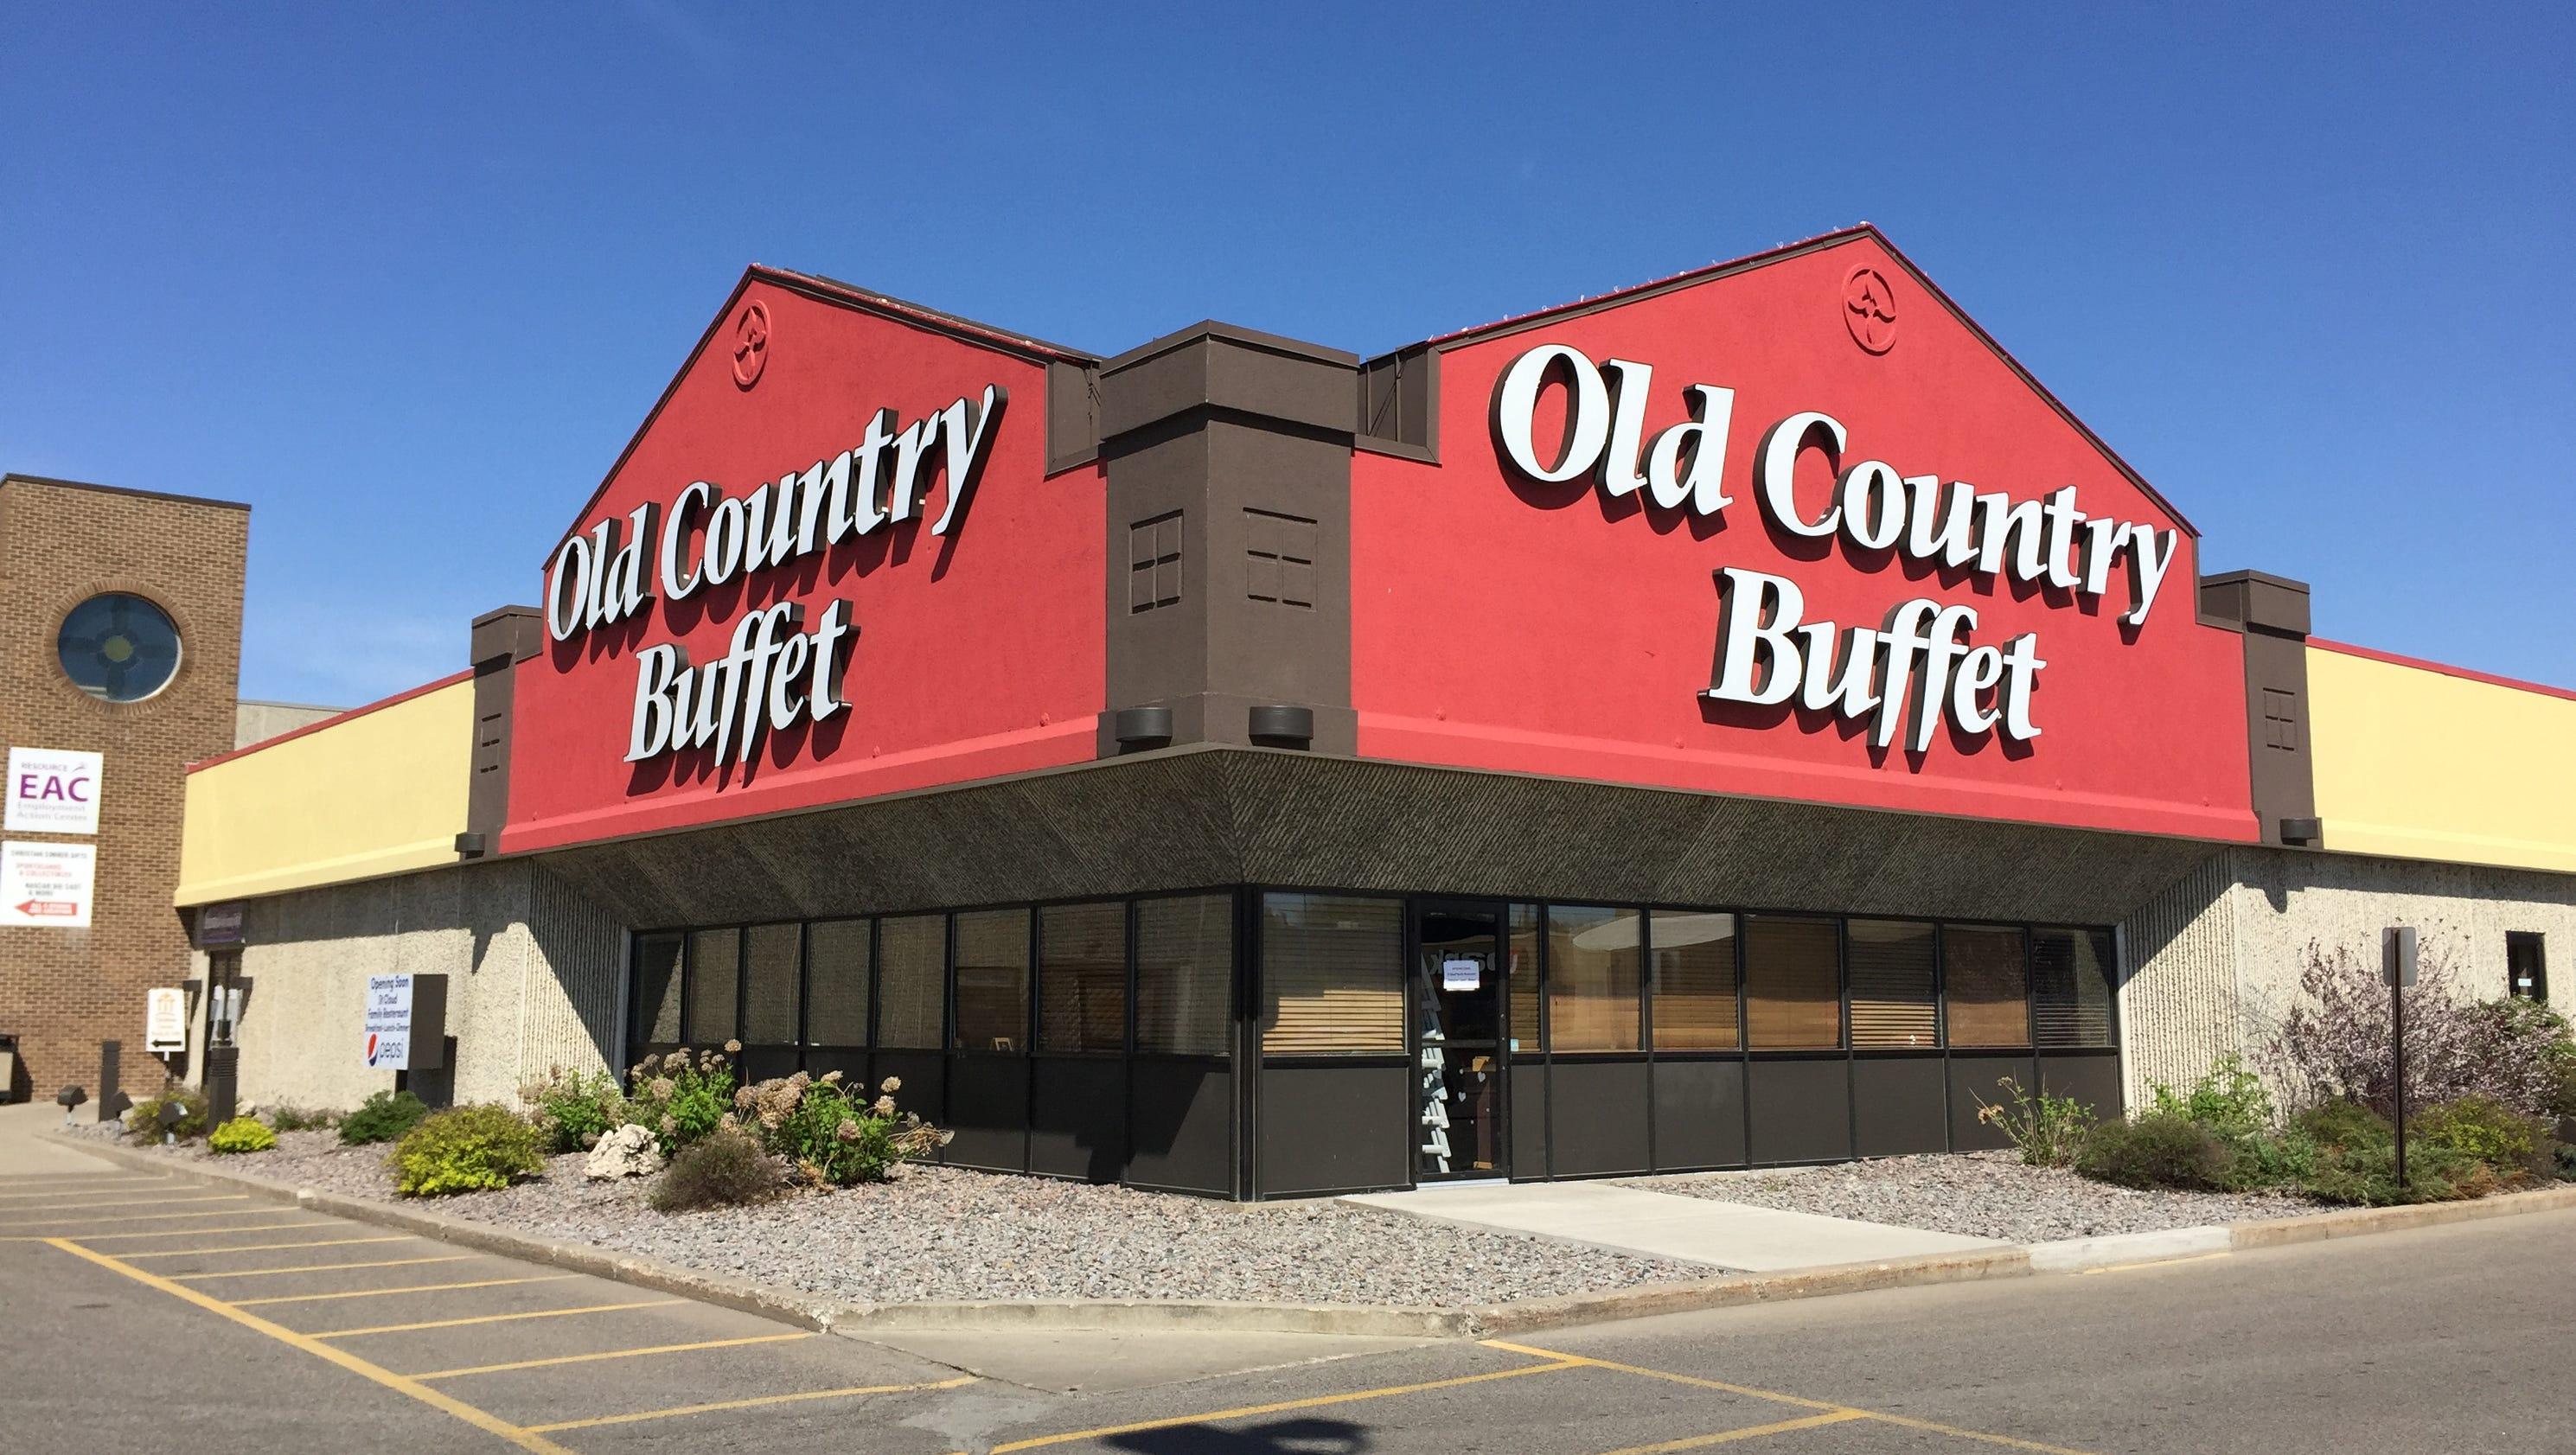 St Cloud Restaurant Deals Chilis Coupons 2018 February